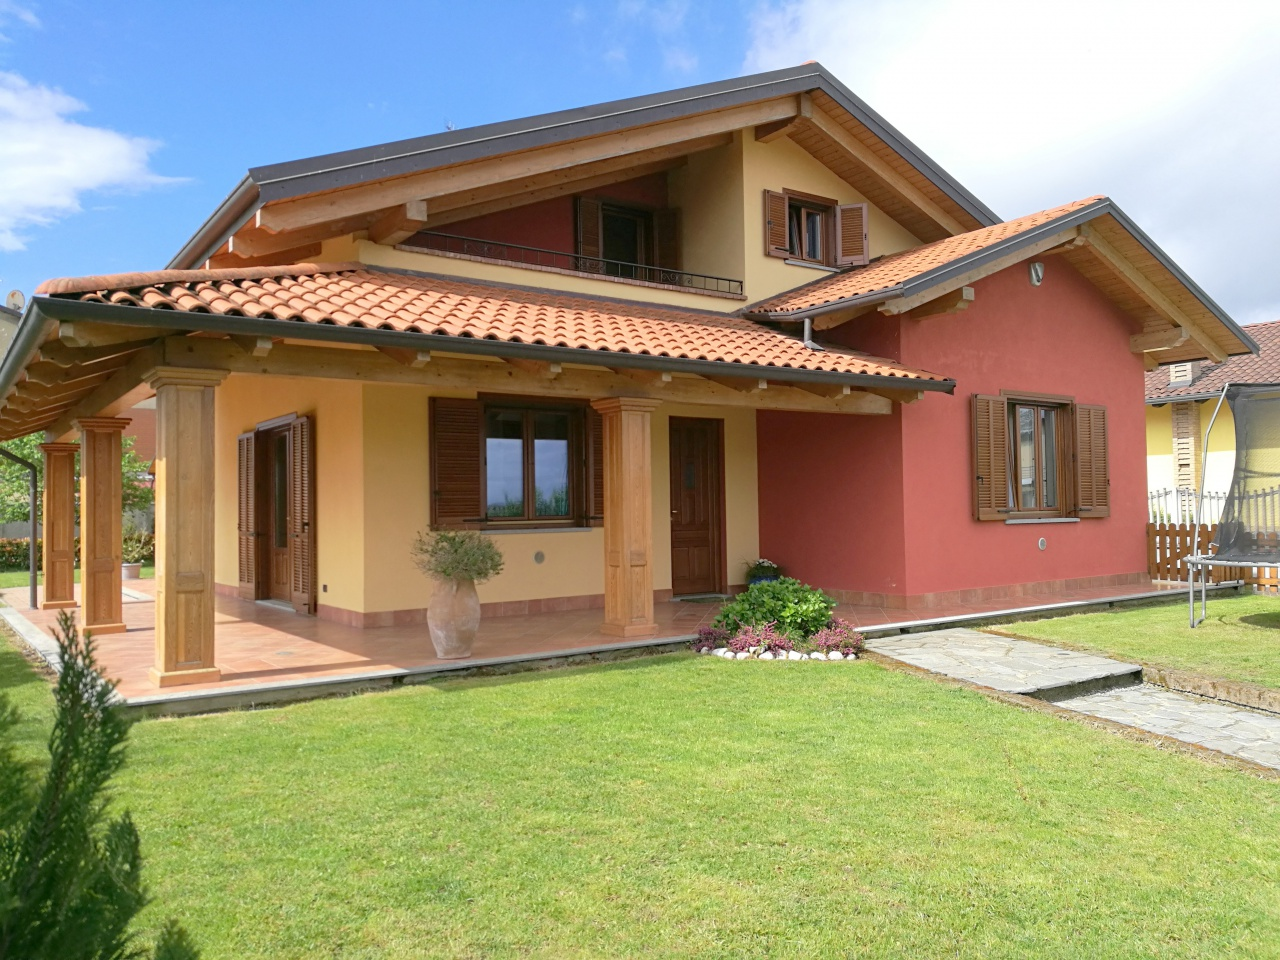 Foto 1 di Casa indipendente VIA GIUSEPPE CARRA, Saluggia